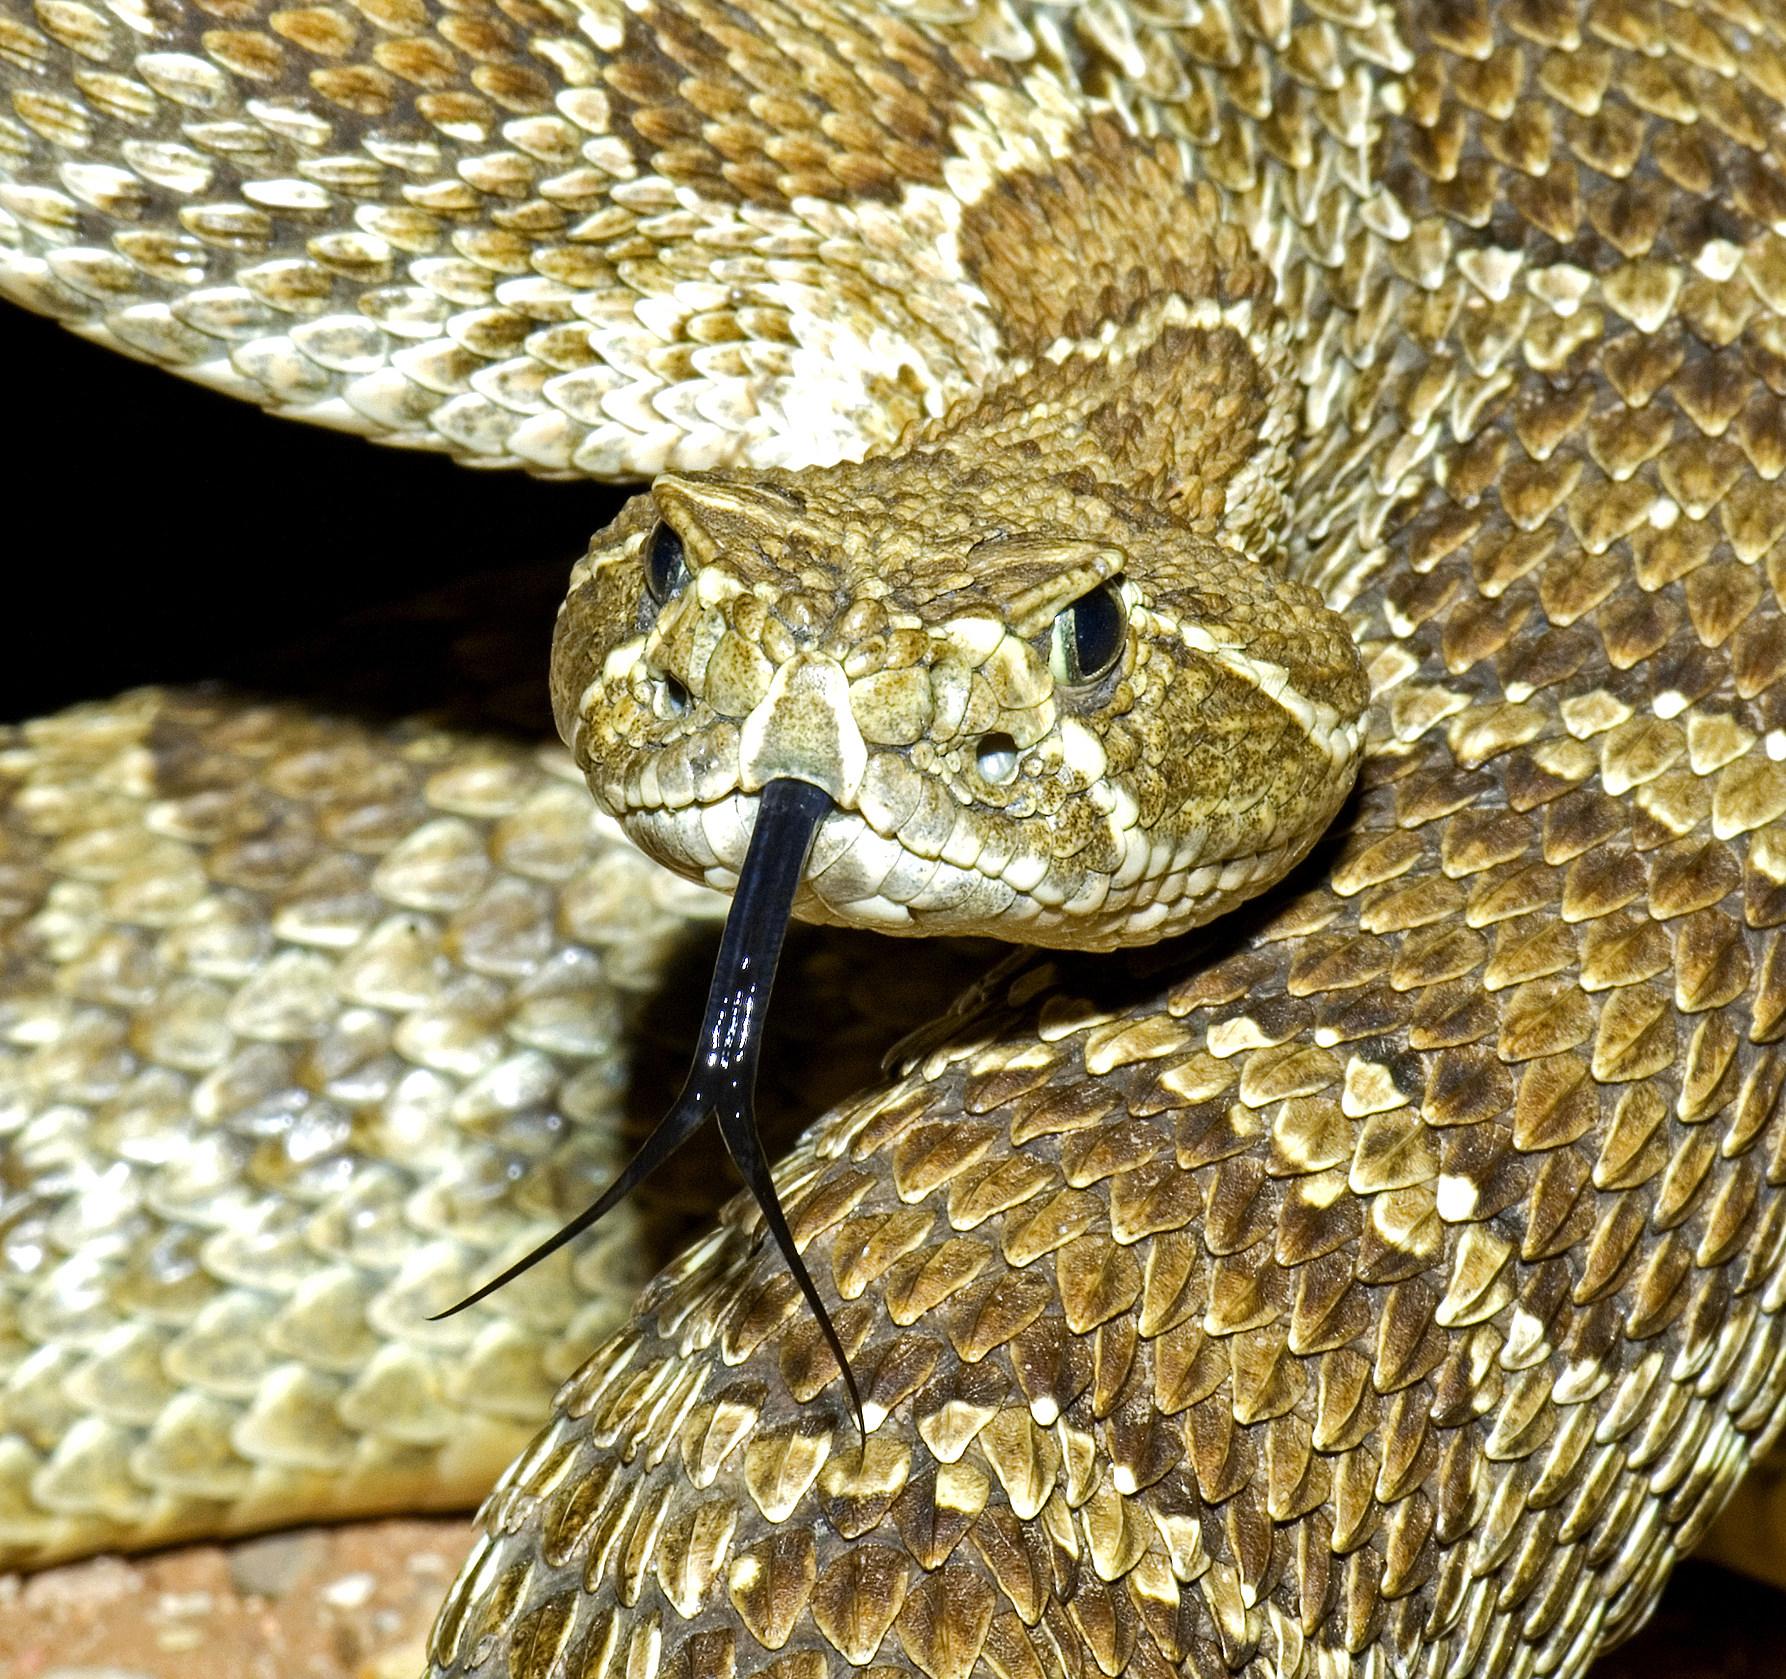 A prairie rattlesnake flicking its tongue